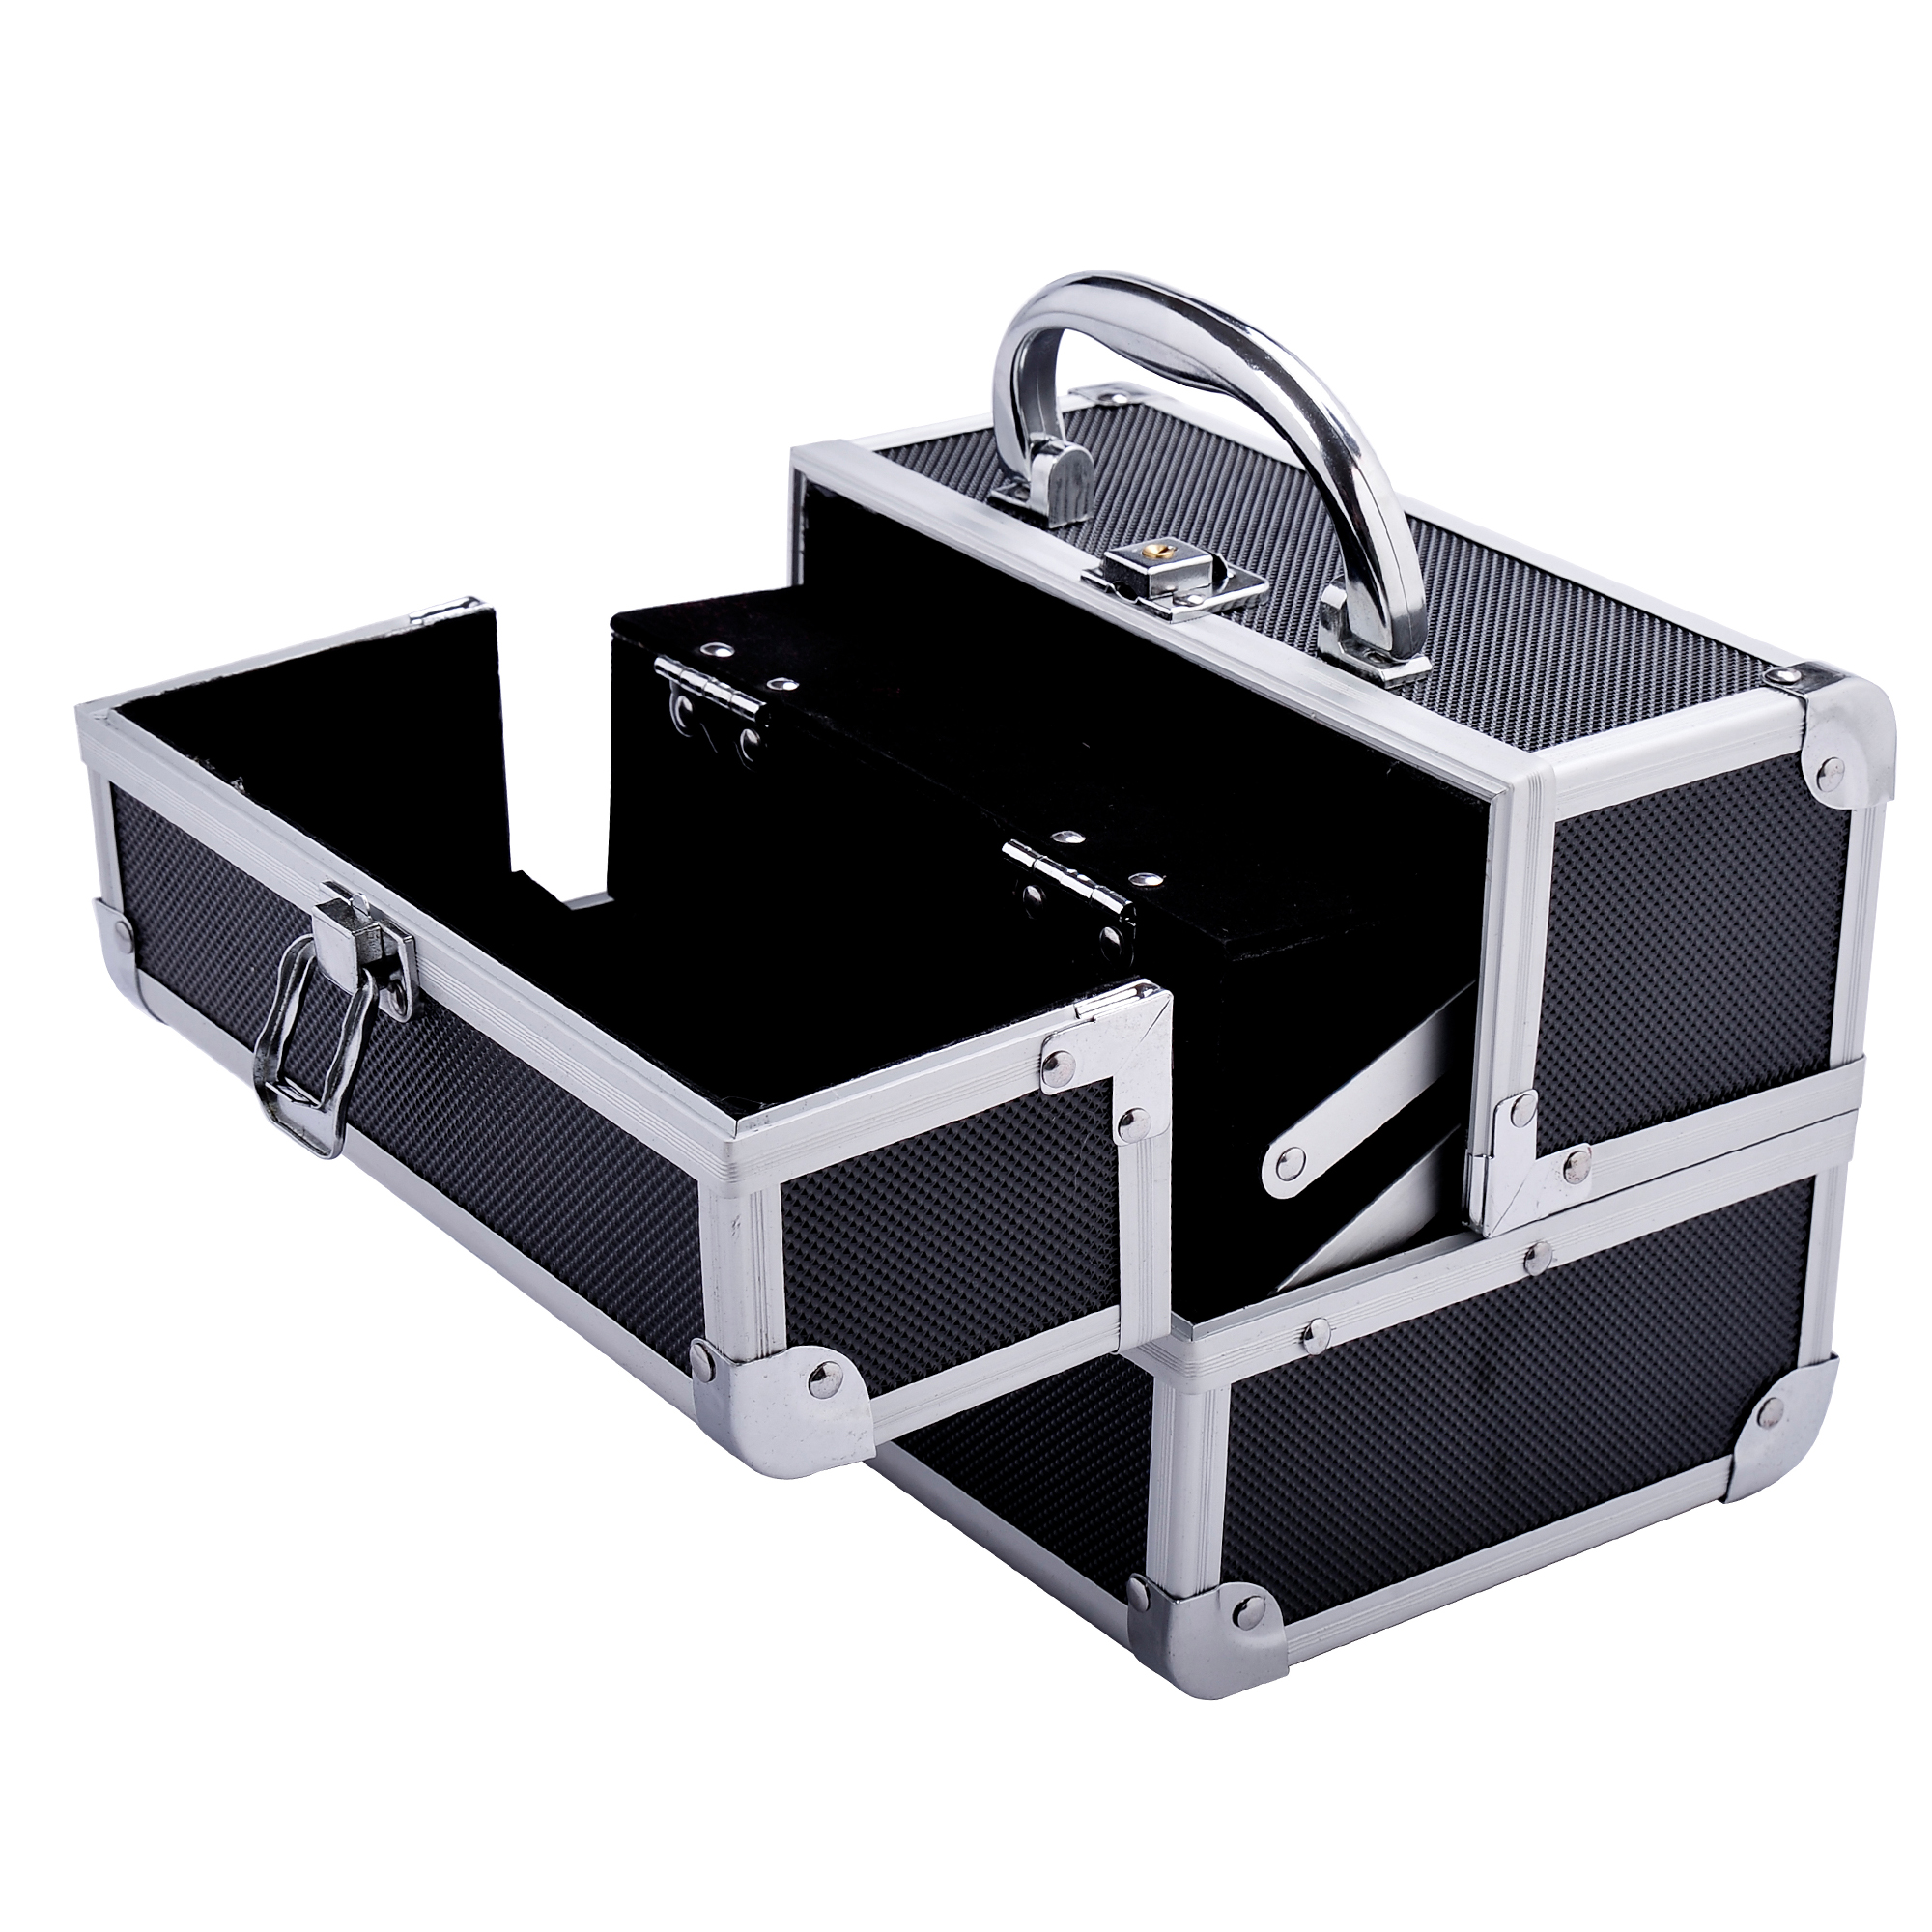 Aluminum-Rolling-Makeup-Train-Case-Trolley-Organizer-Storage-Box-Lockable thumbnail 26